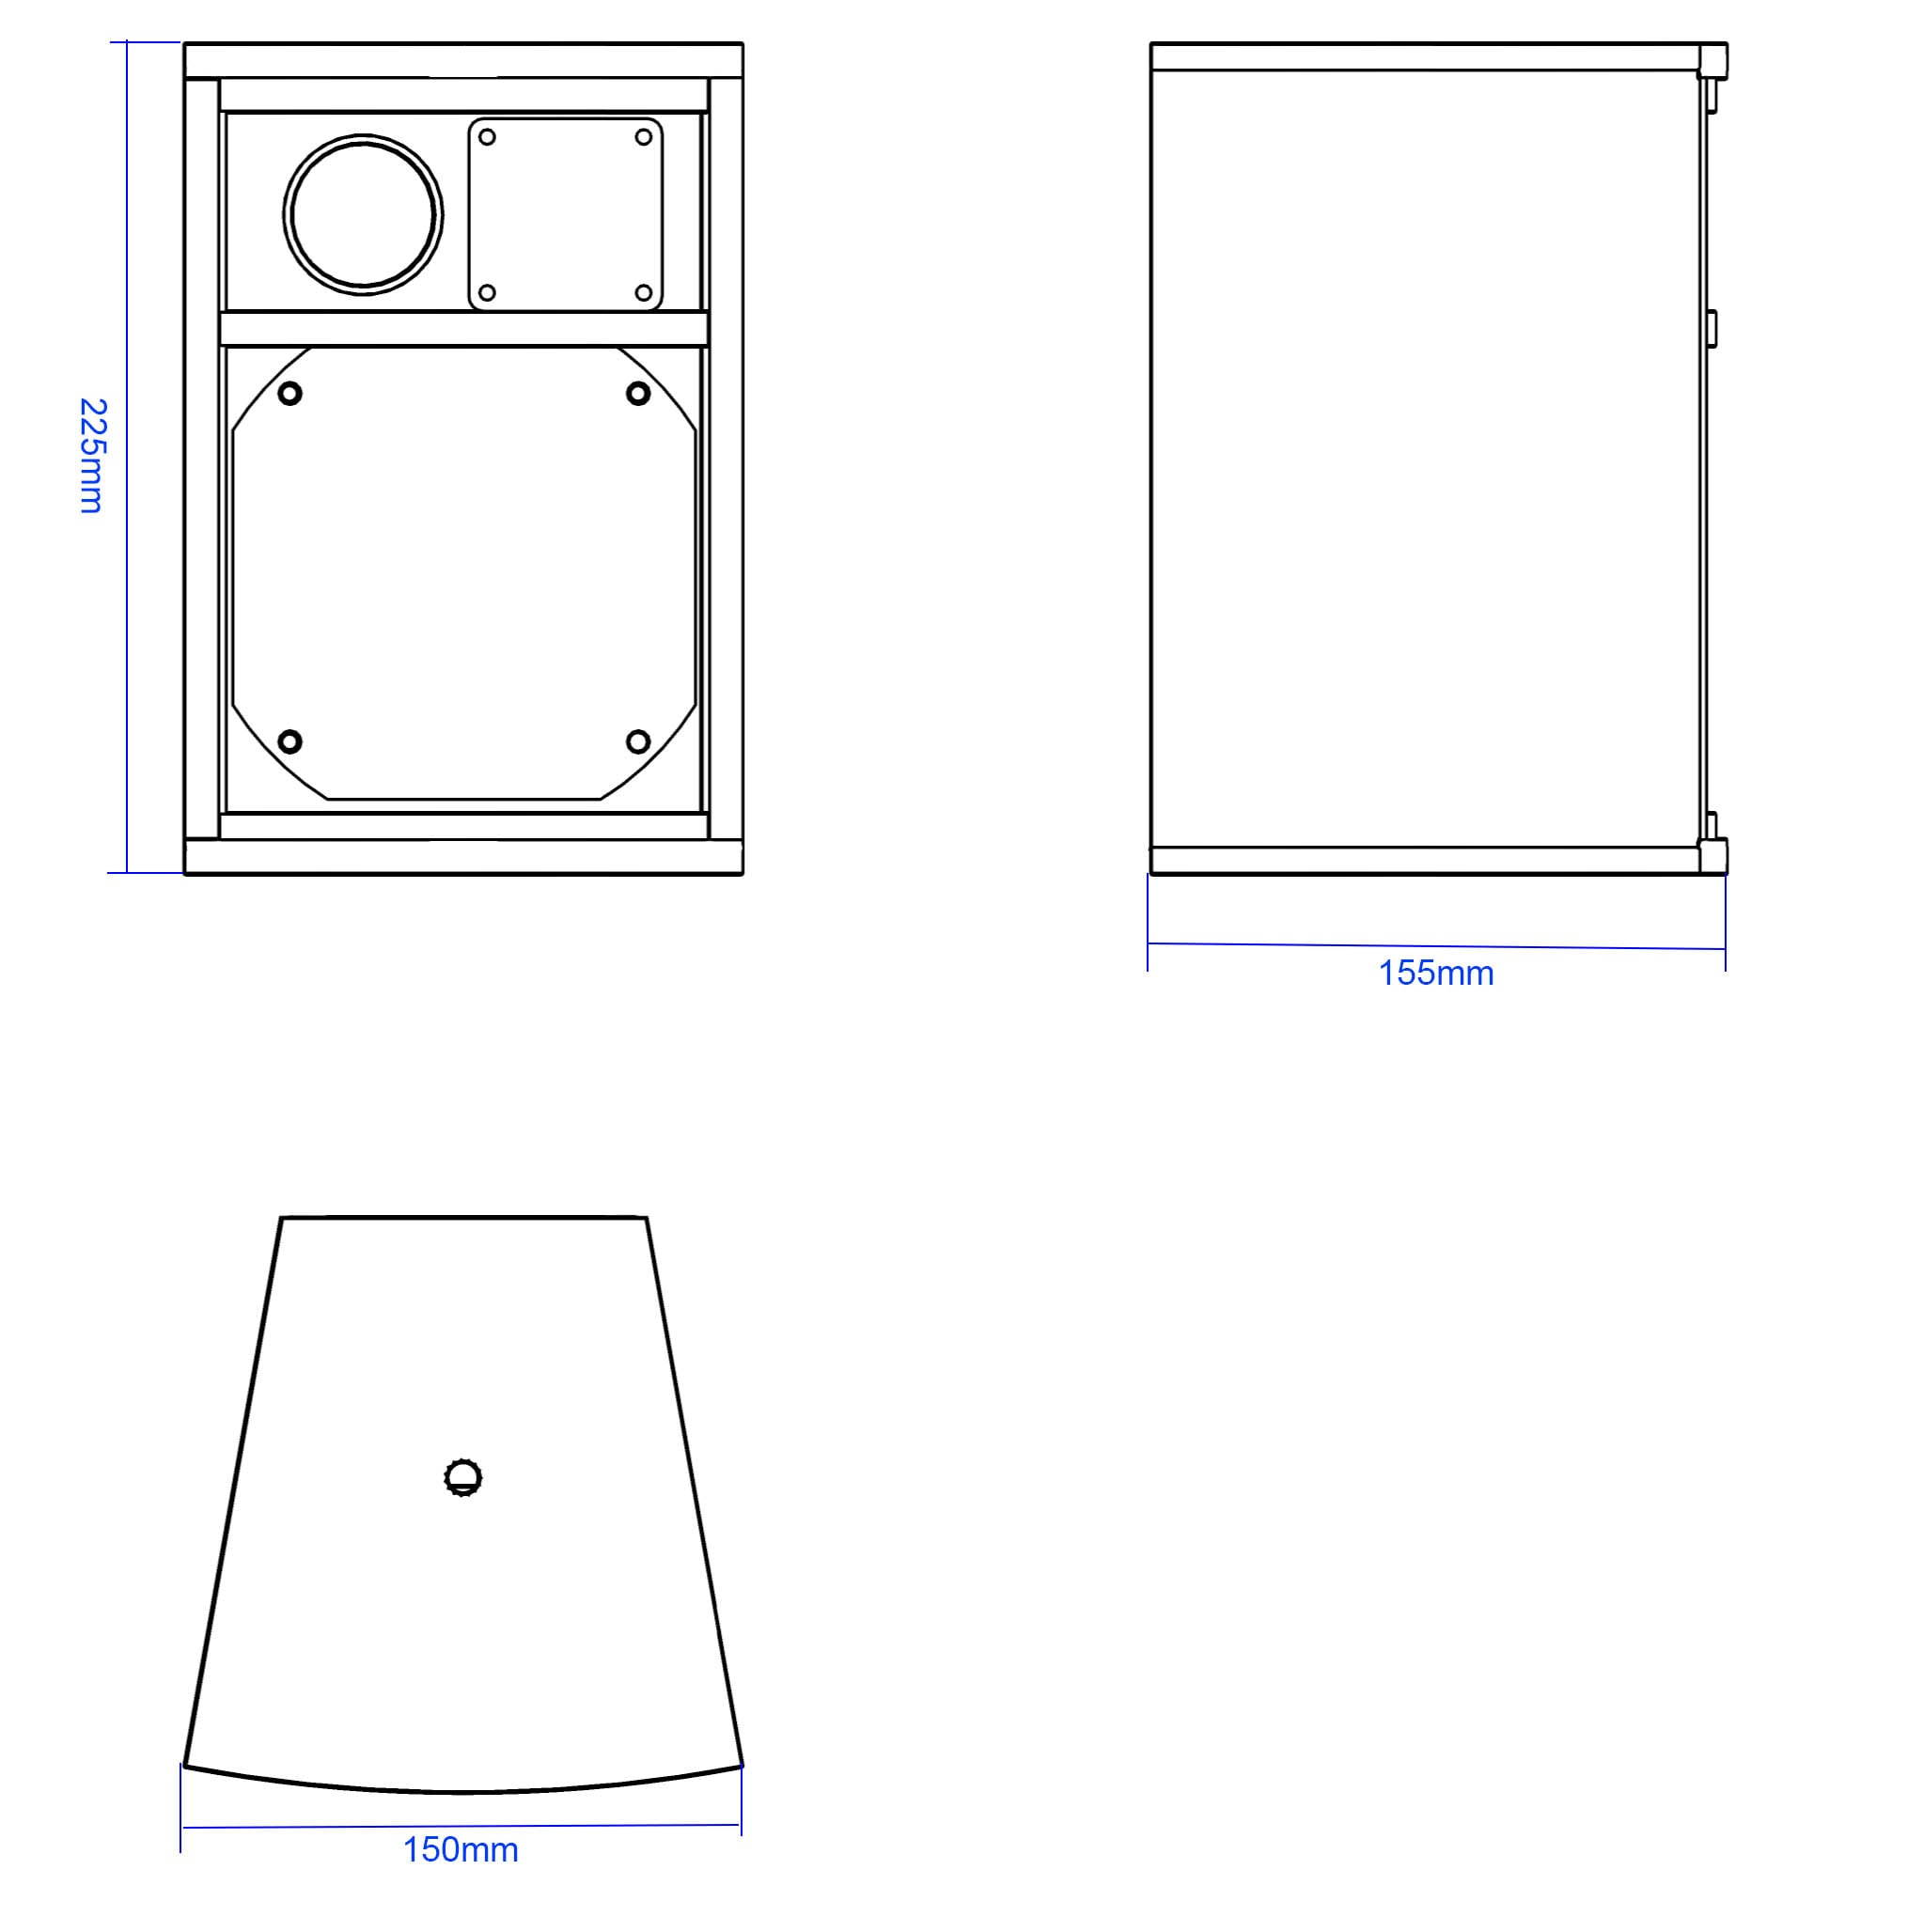 Apt CLF511 Ultra compact full range 5″ cabinet - 225, 150, 155mm